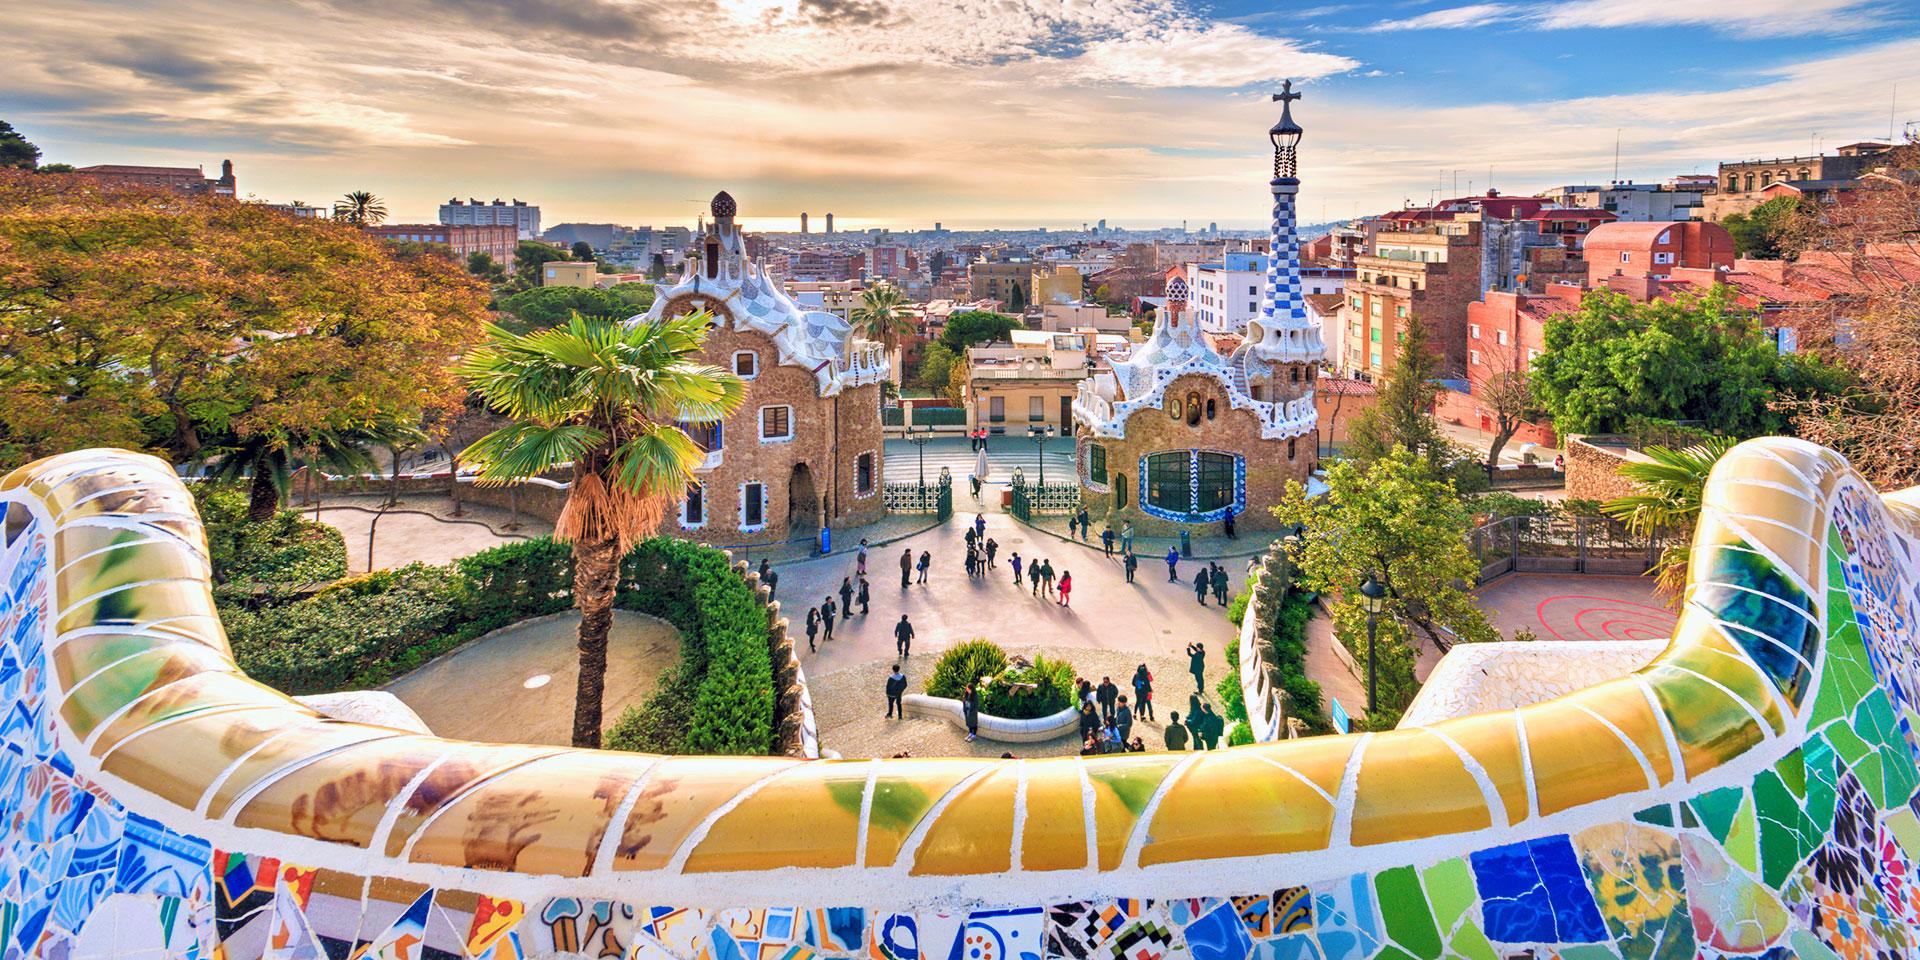 residencia-universitaria-barcelona